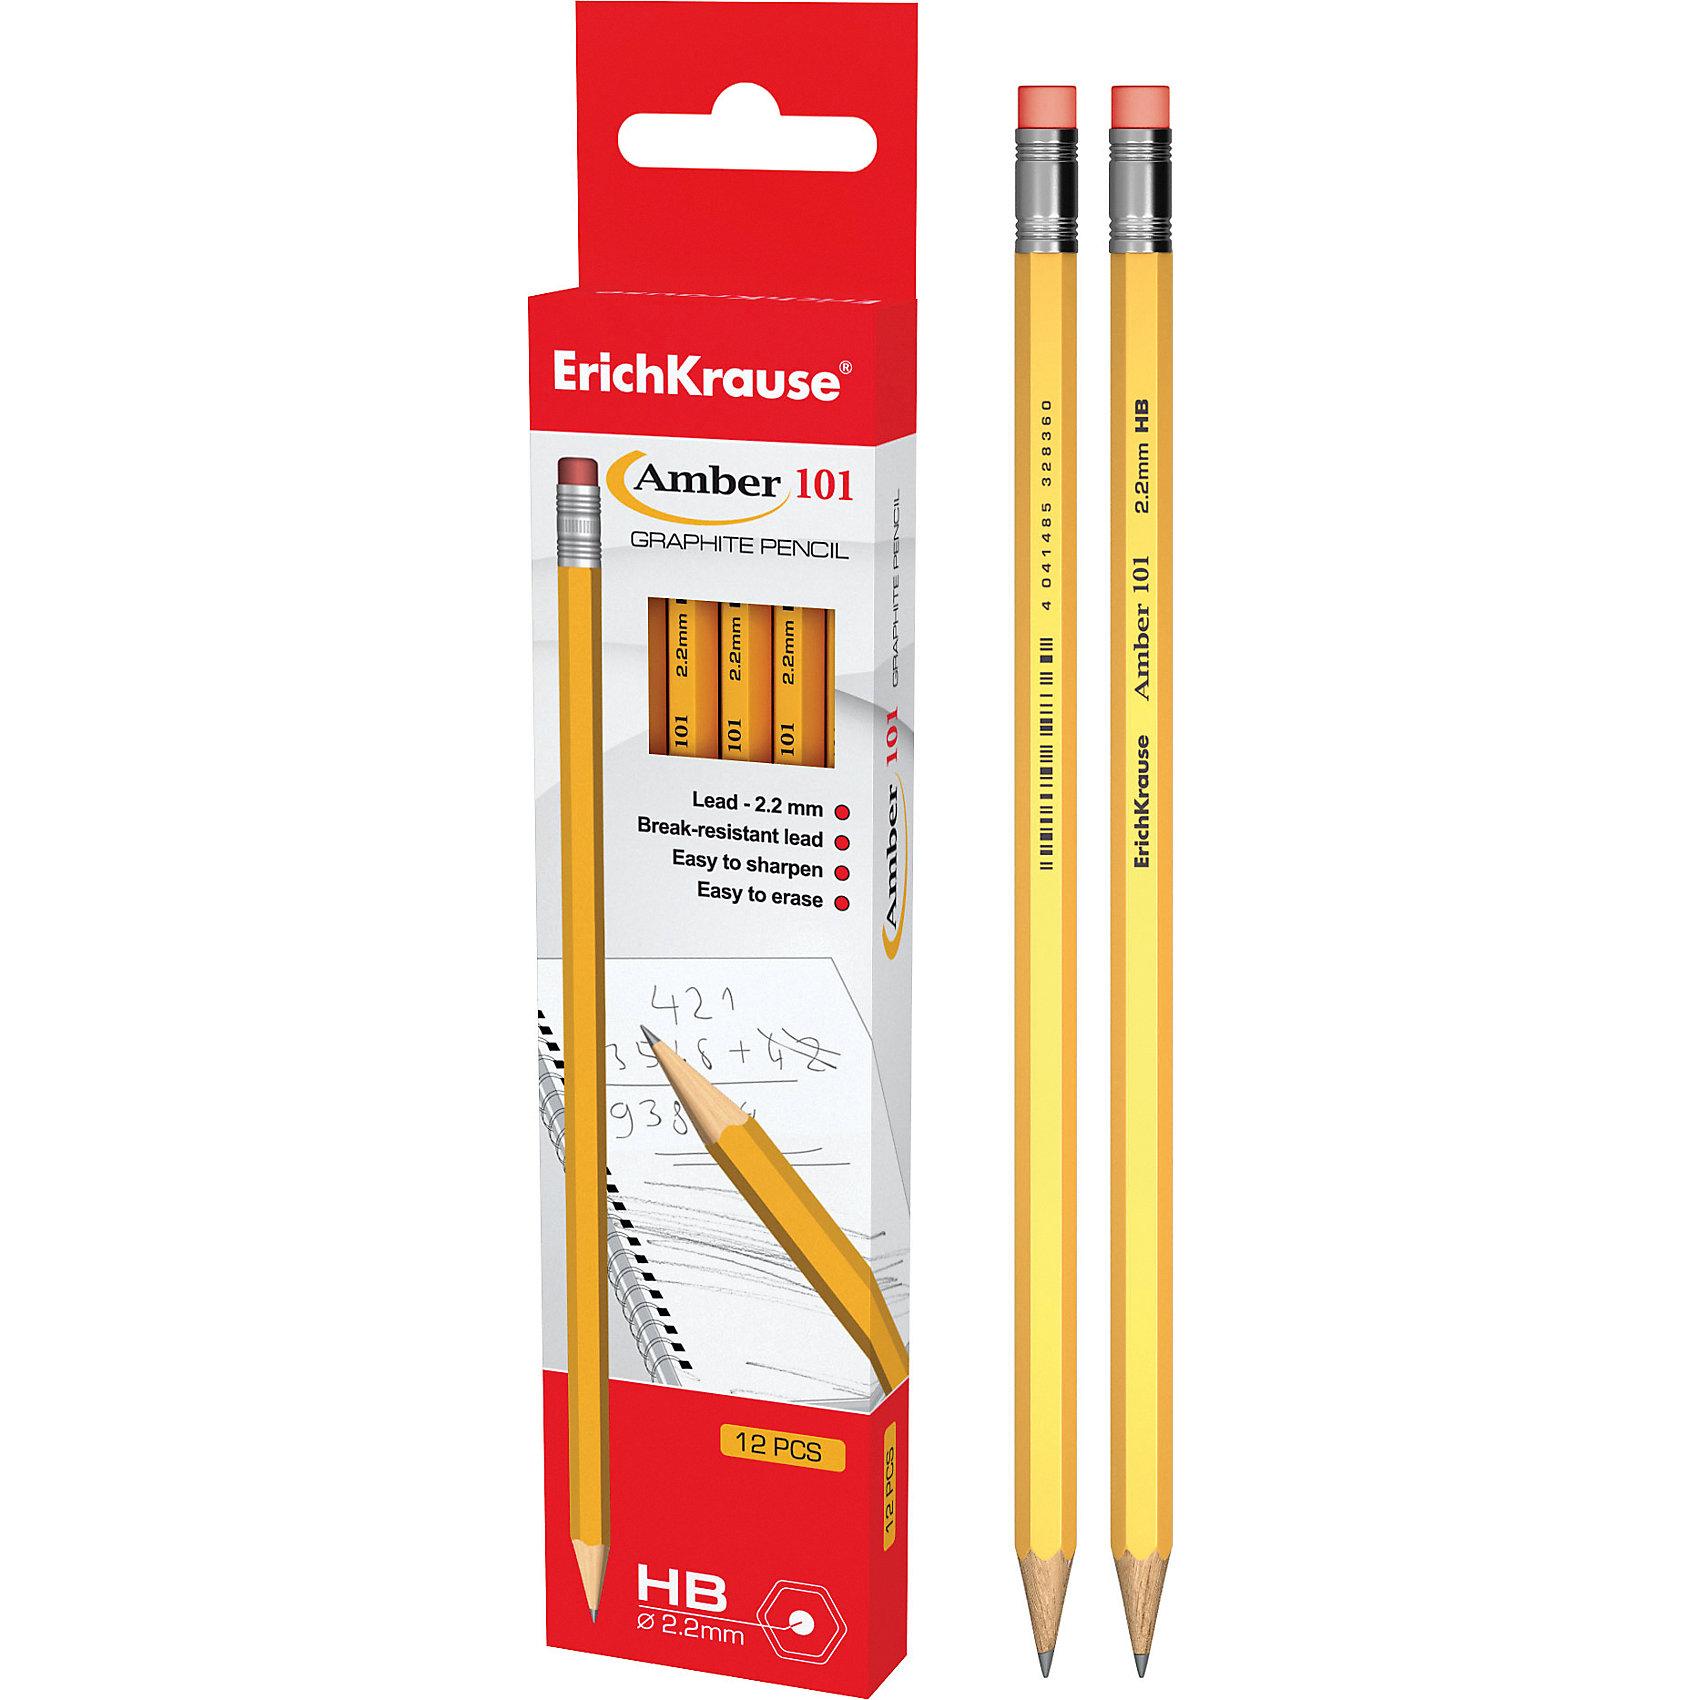 Чернографитный карандаш AMBER 101 (HB) шестигранный с ластиком, 12 шт., Erich Krauseшестигранный карандаш с ластиком, HB<br><br>Ширина мм: 45<br>Глубина мм: 220<br>Высота мм: 150<br>Вес г: 120<br>Возраст от месяцев: 84<br>Возраст до месяцев: 2147483647<br>Пол: Унисекс<br>Возраст: Детский<br>SKU: 5543304